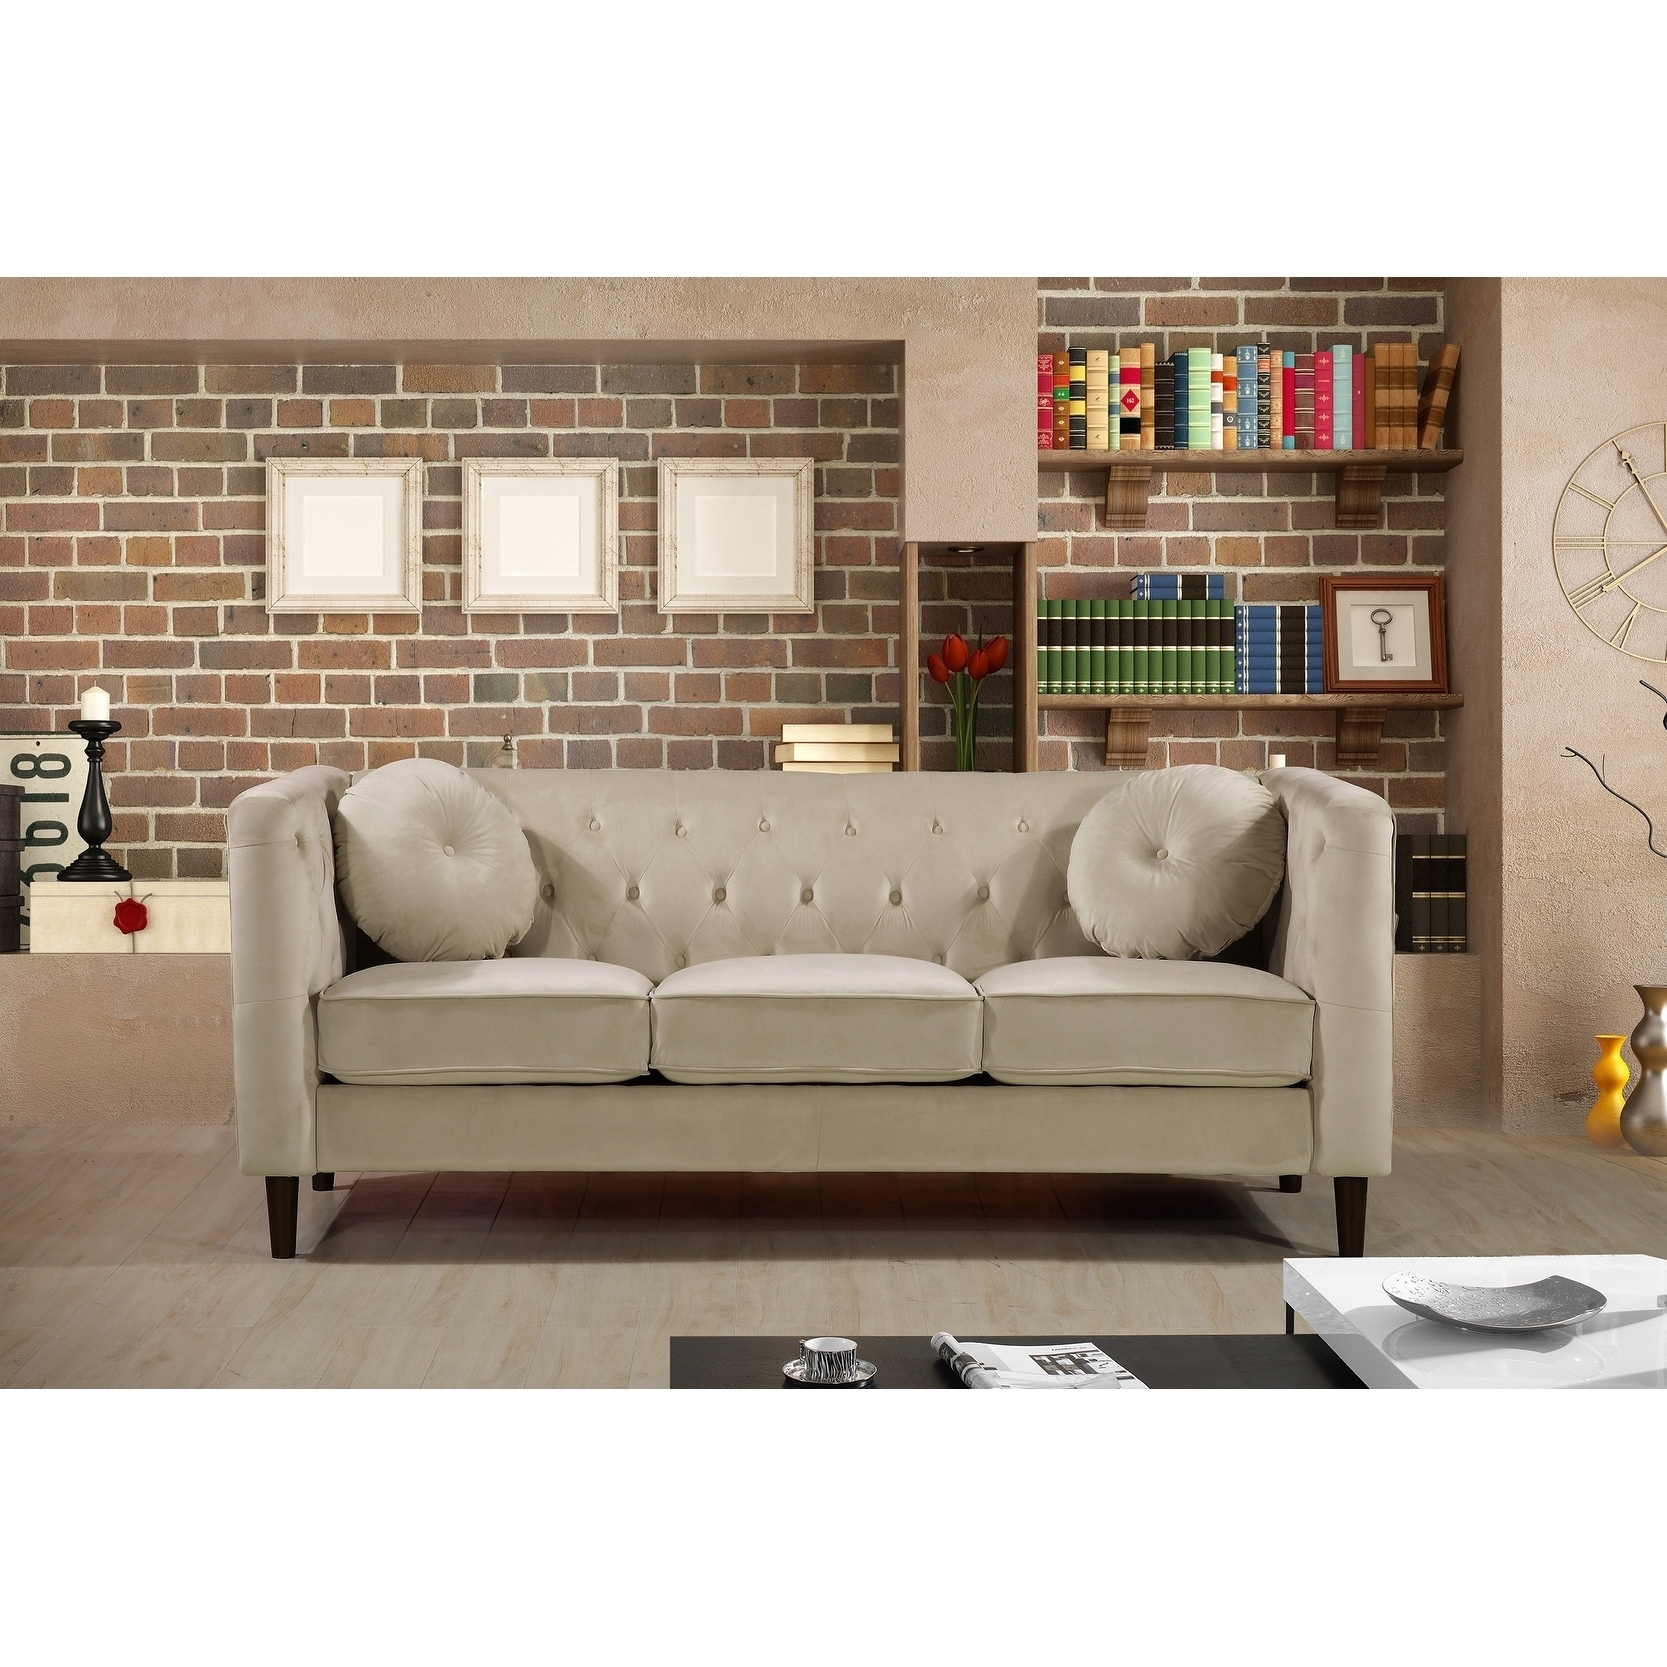 full austin size futons store colors walmart multiple mattress com futon ip